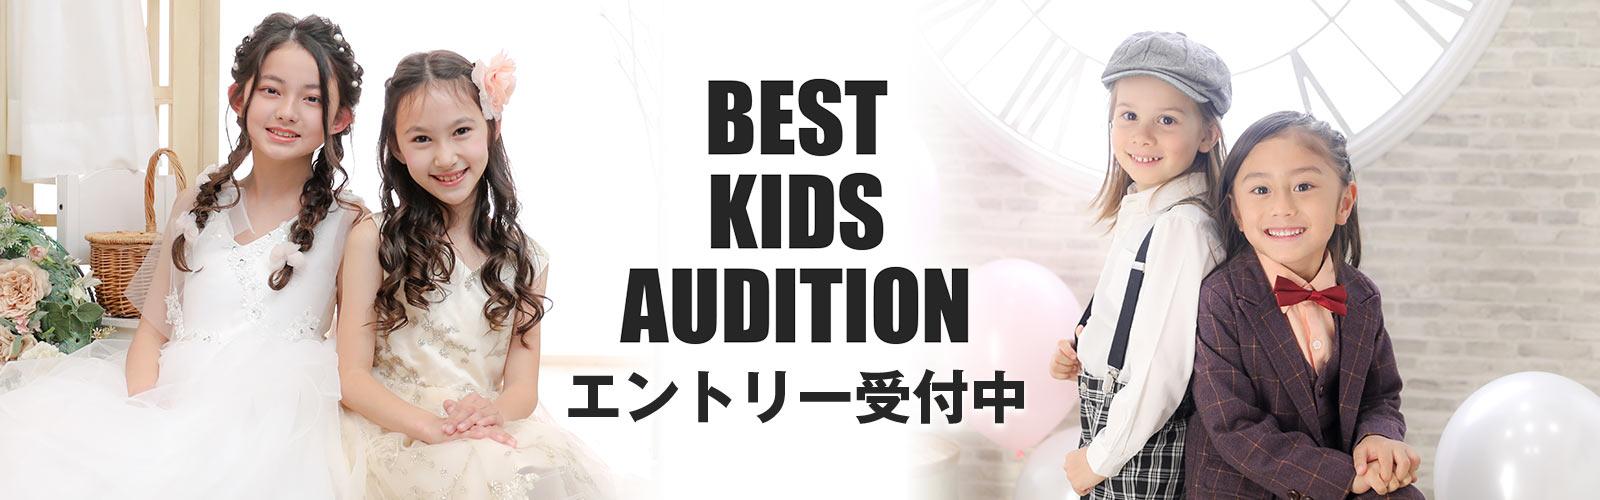 BEST KIDS AUDITION 2022